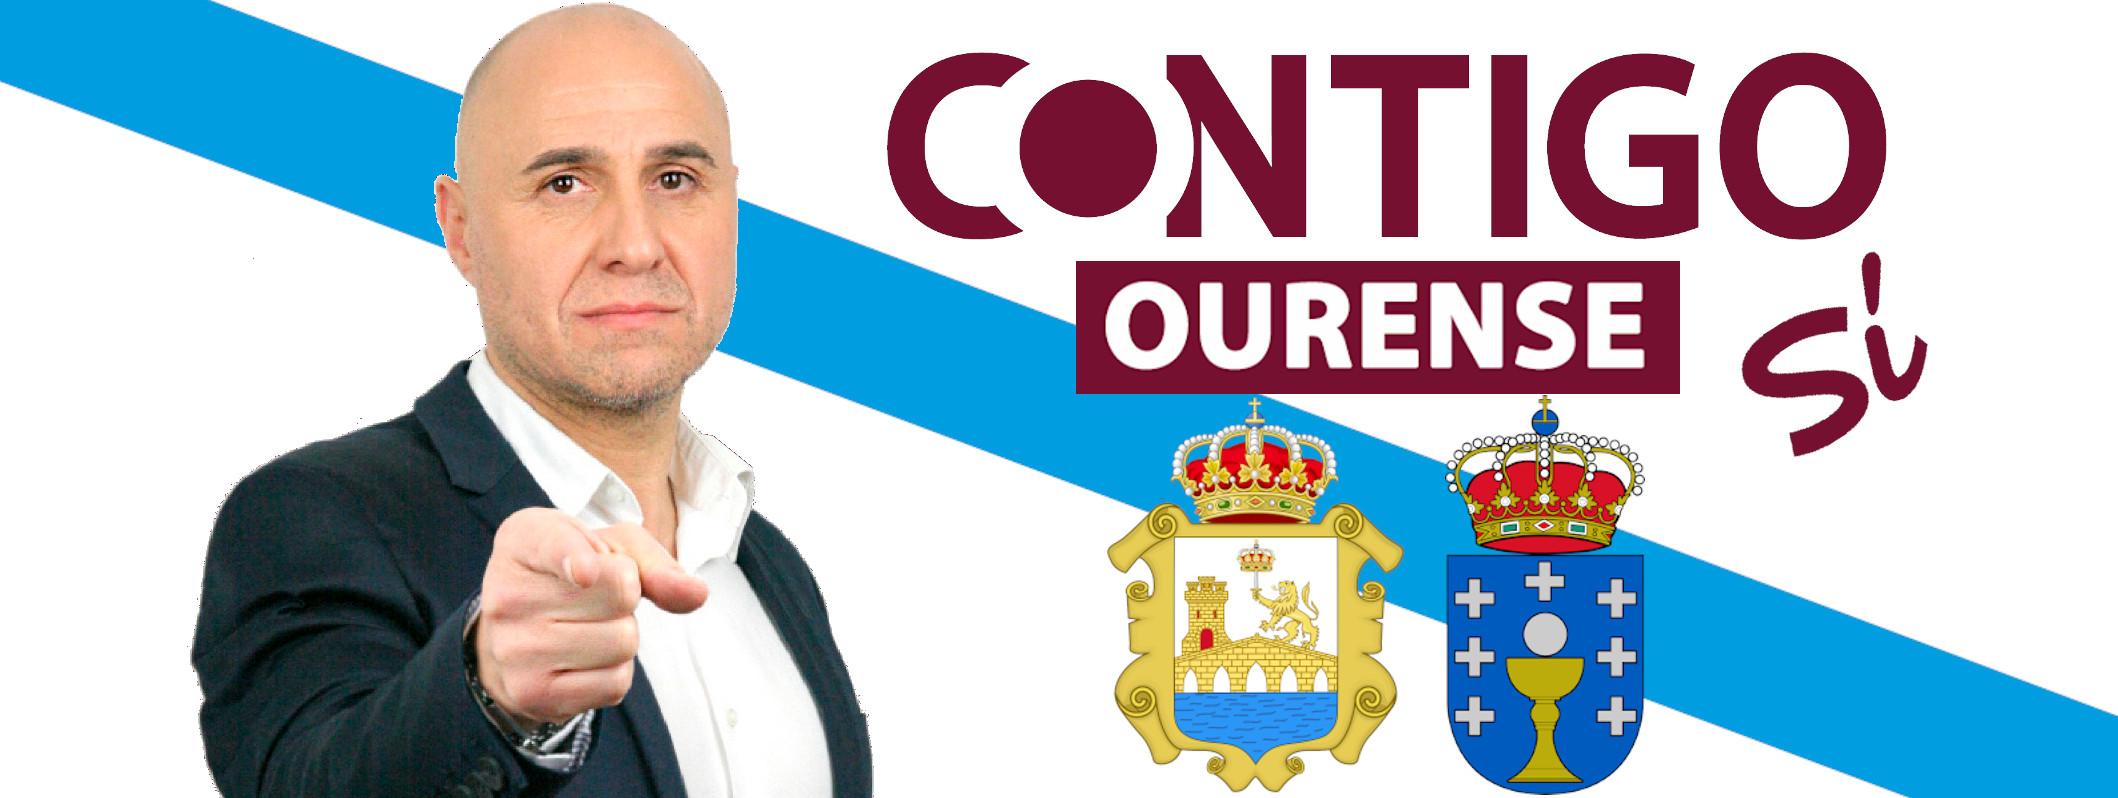 Sito del Valle, Candidato de Contigo Ourense